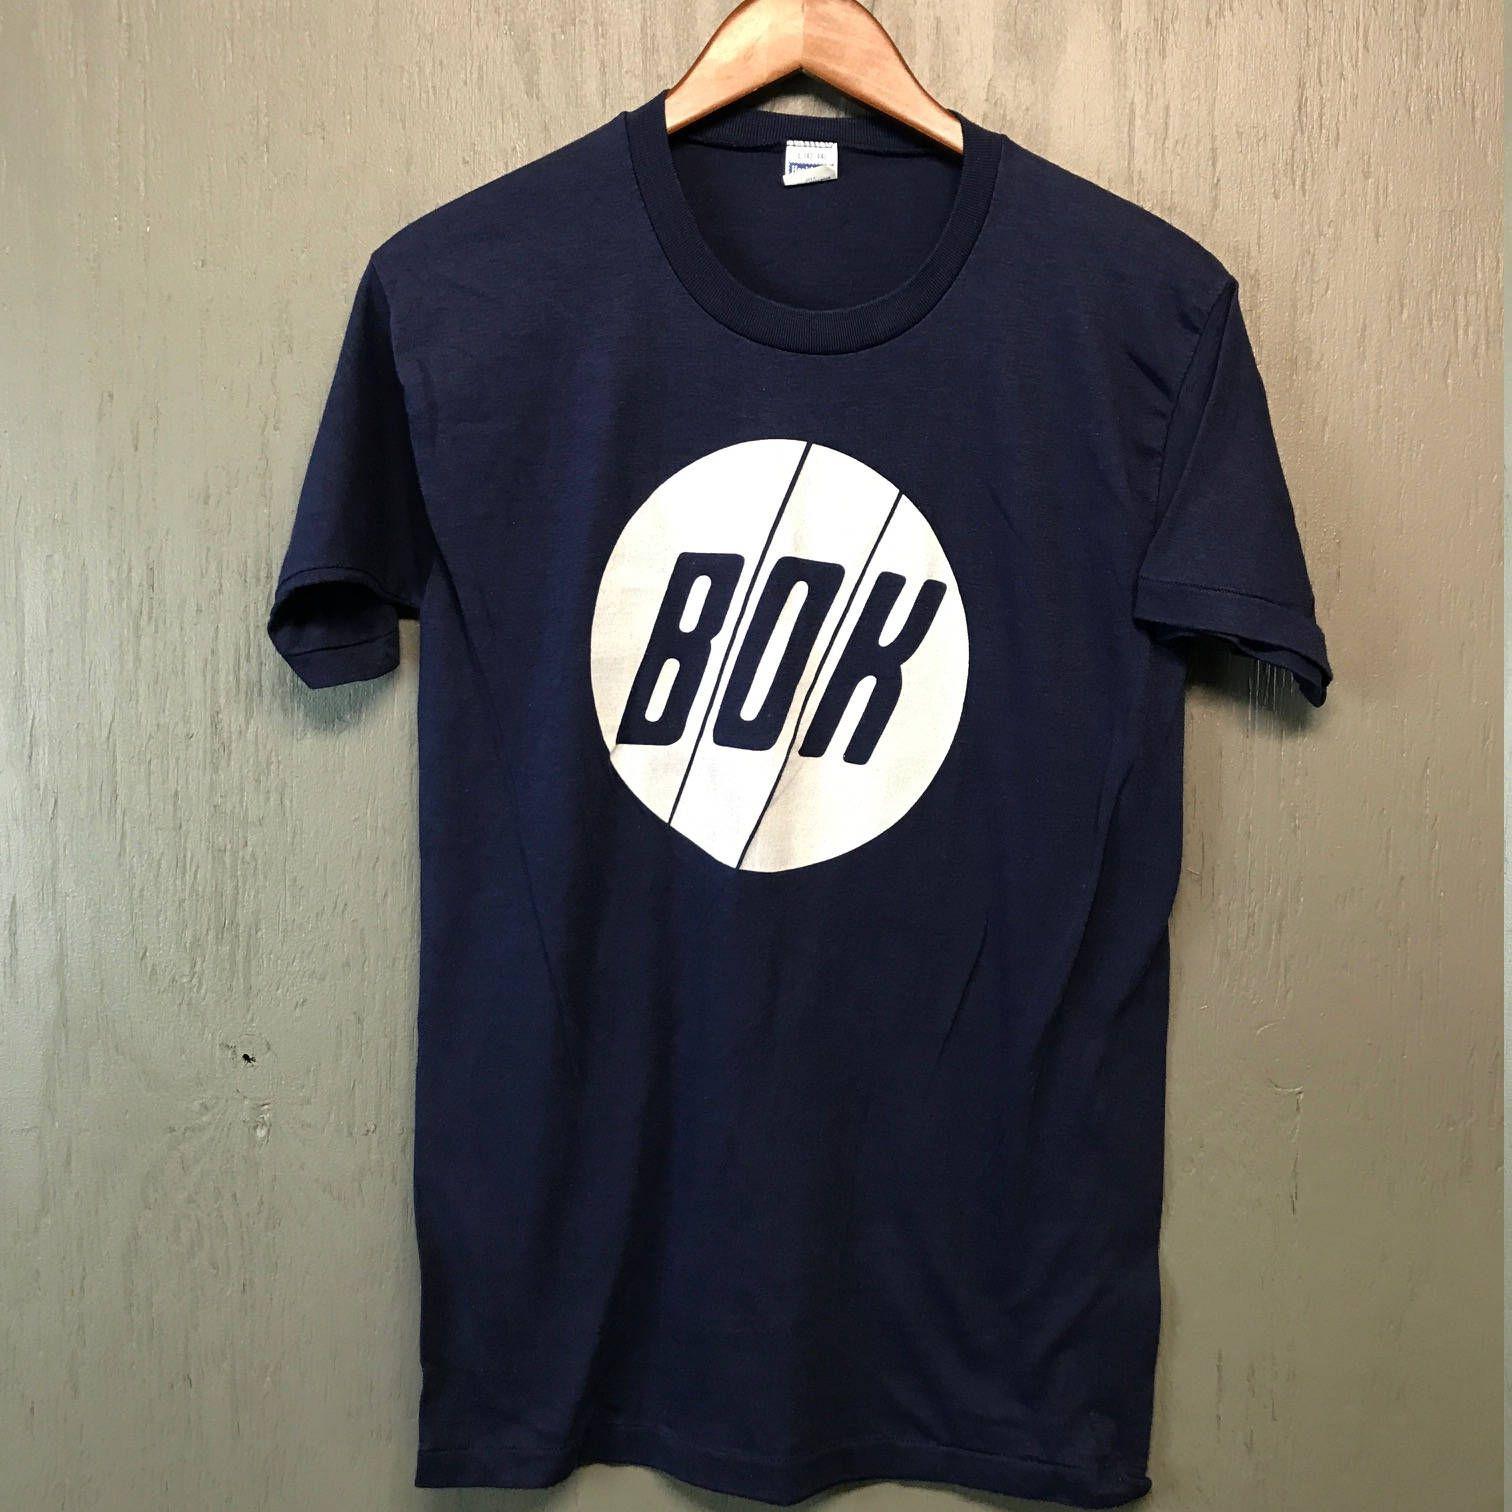 S * nos thin vintage 80s BOK t shirt